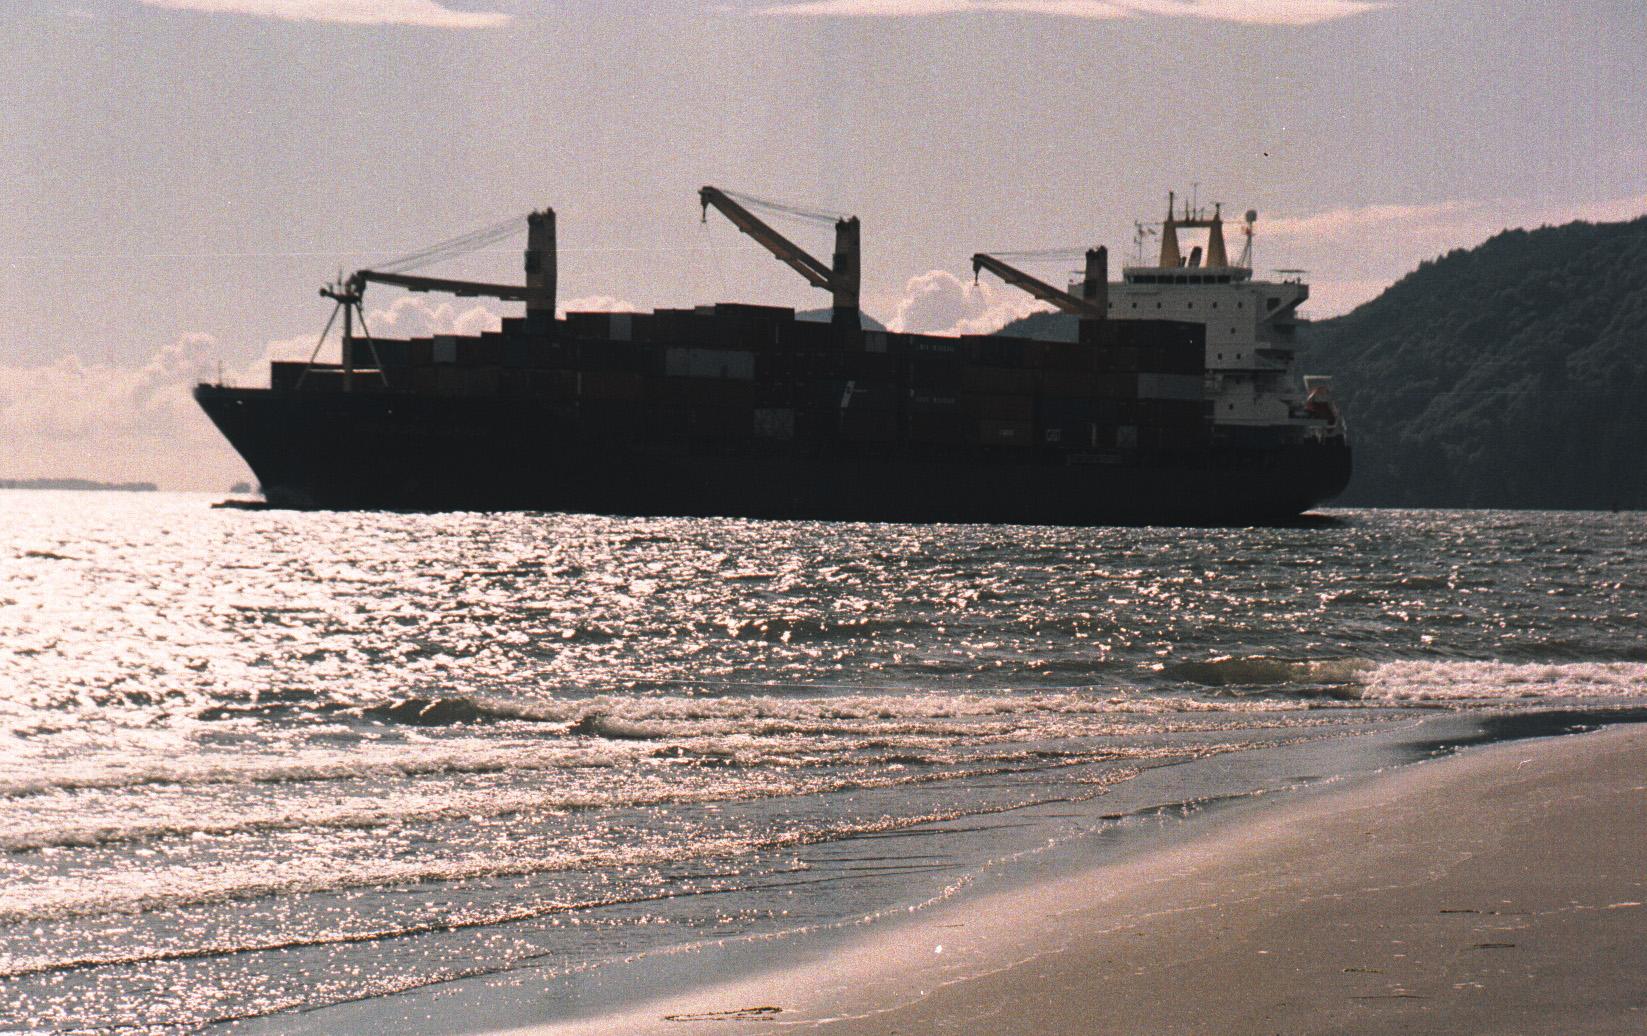 Port of Wahkiakum County No. 2